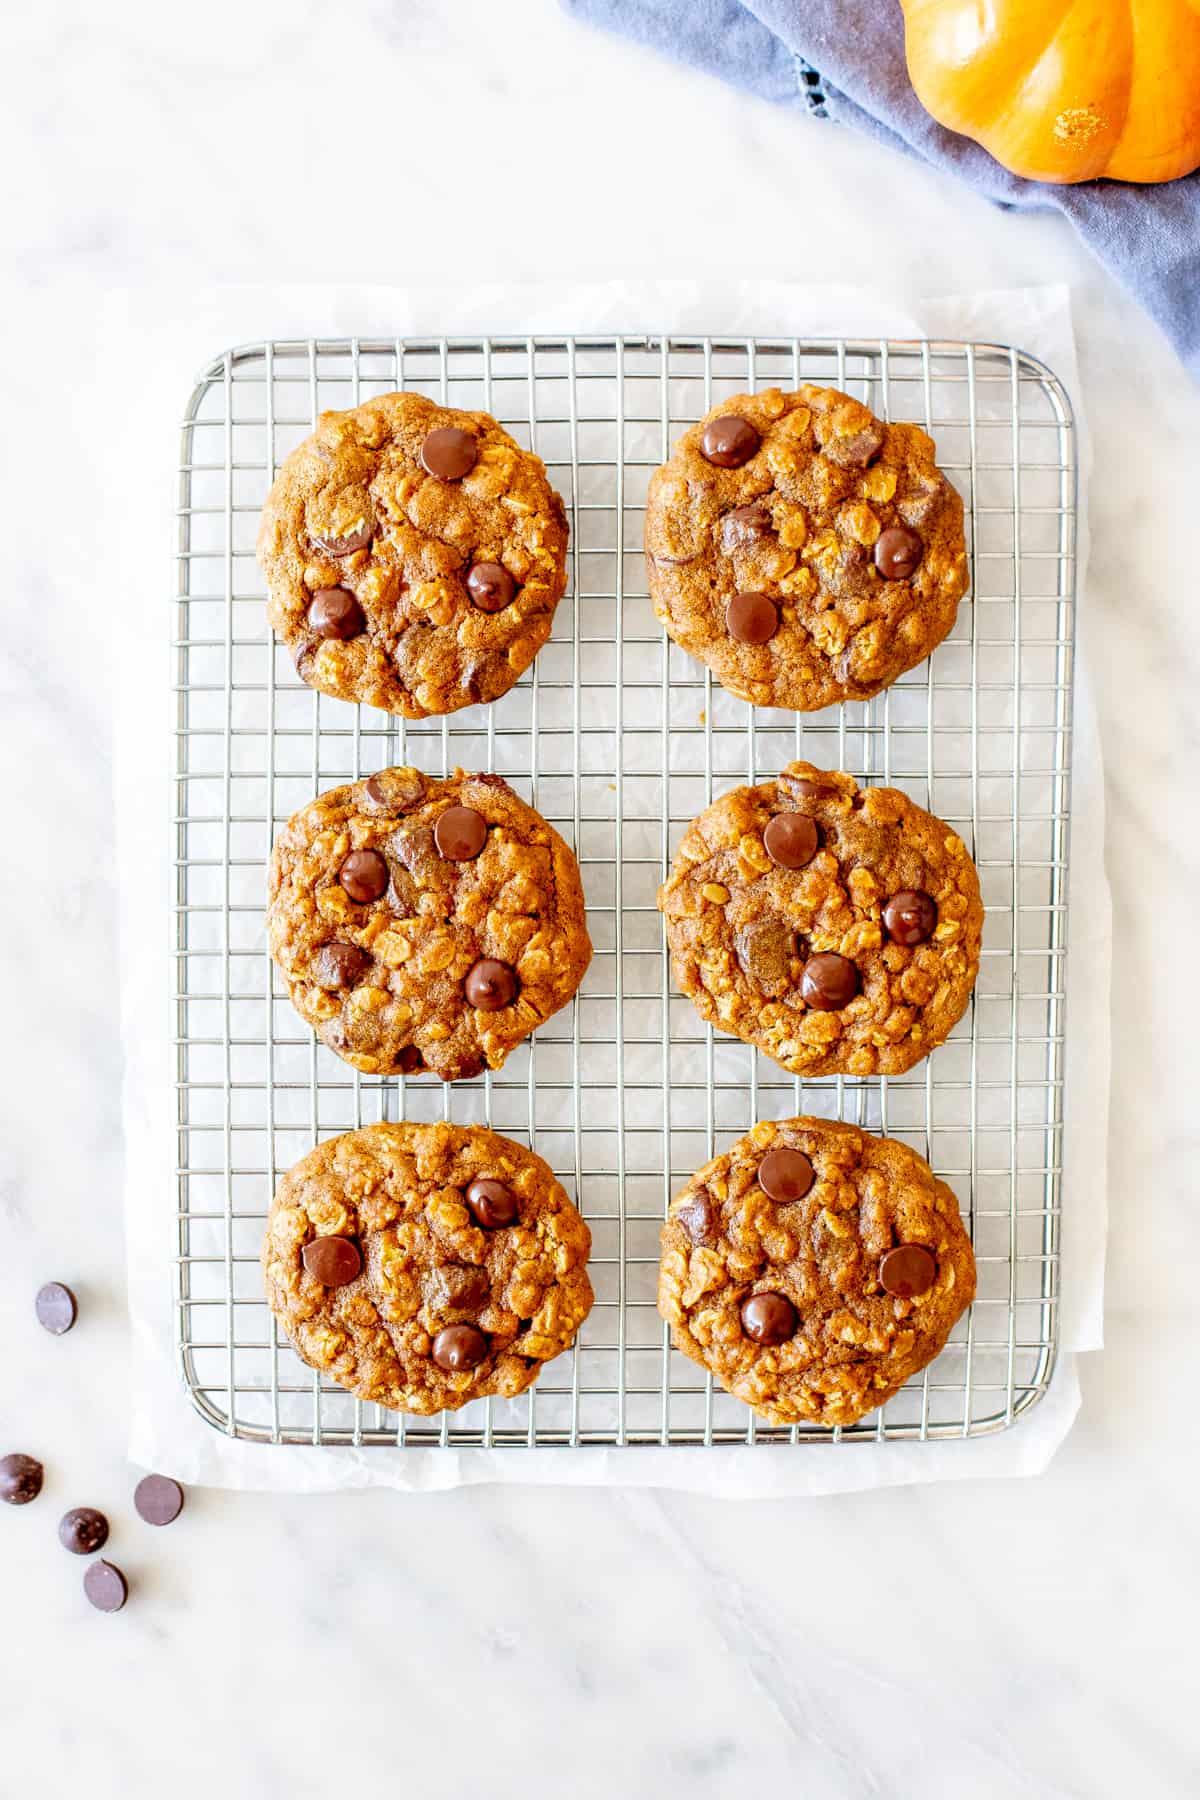 6 pumpkin chocolate chip cookies on a cookie rack.